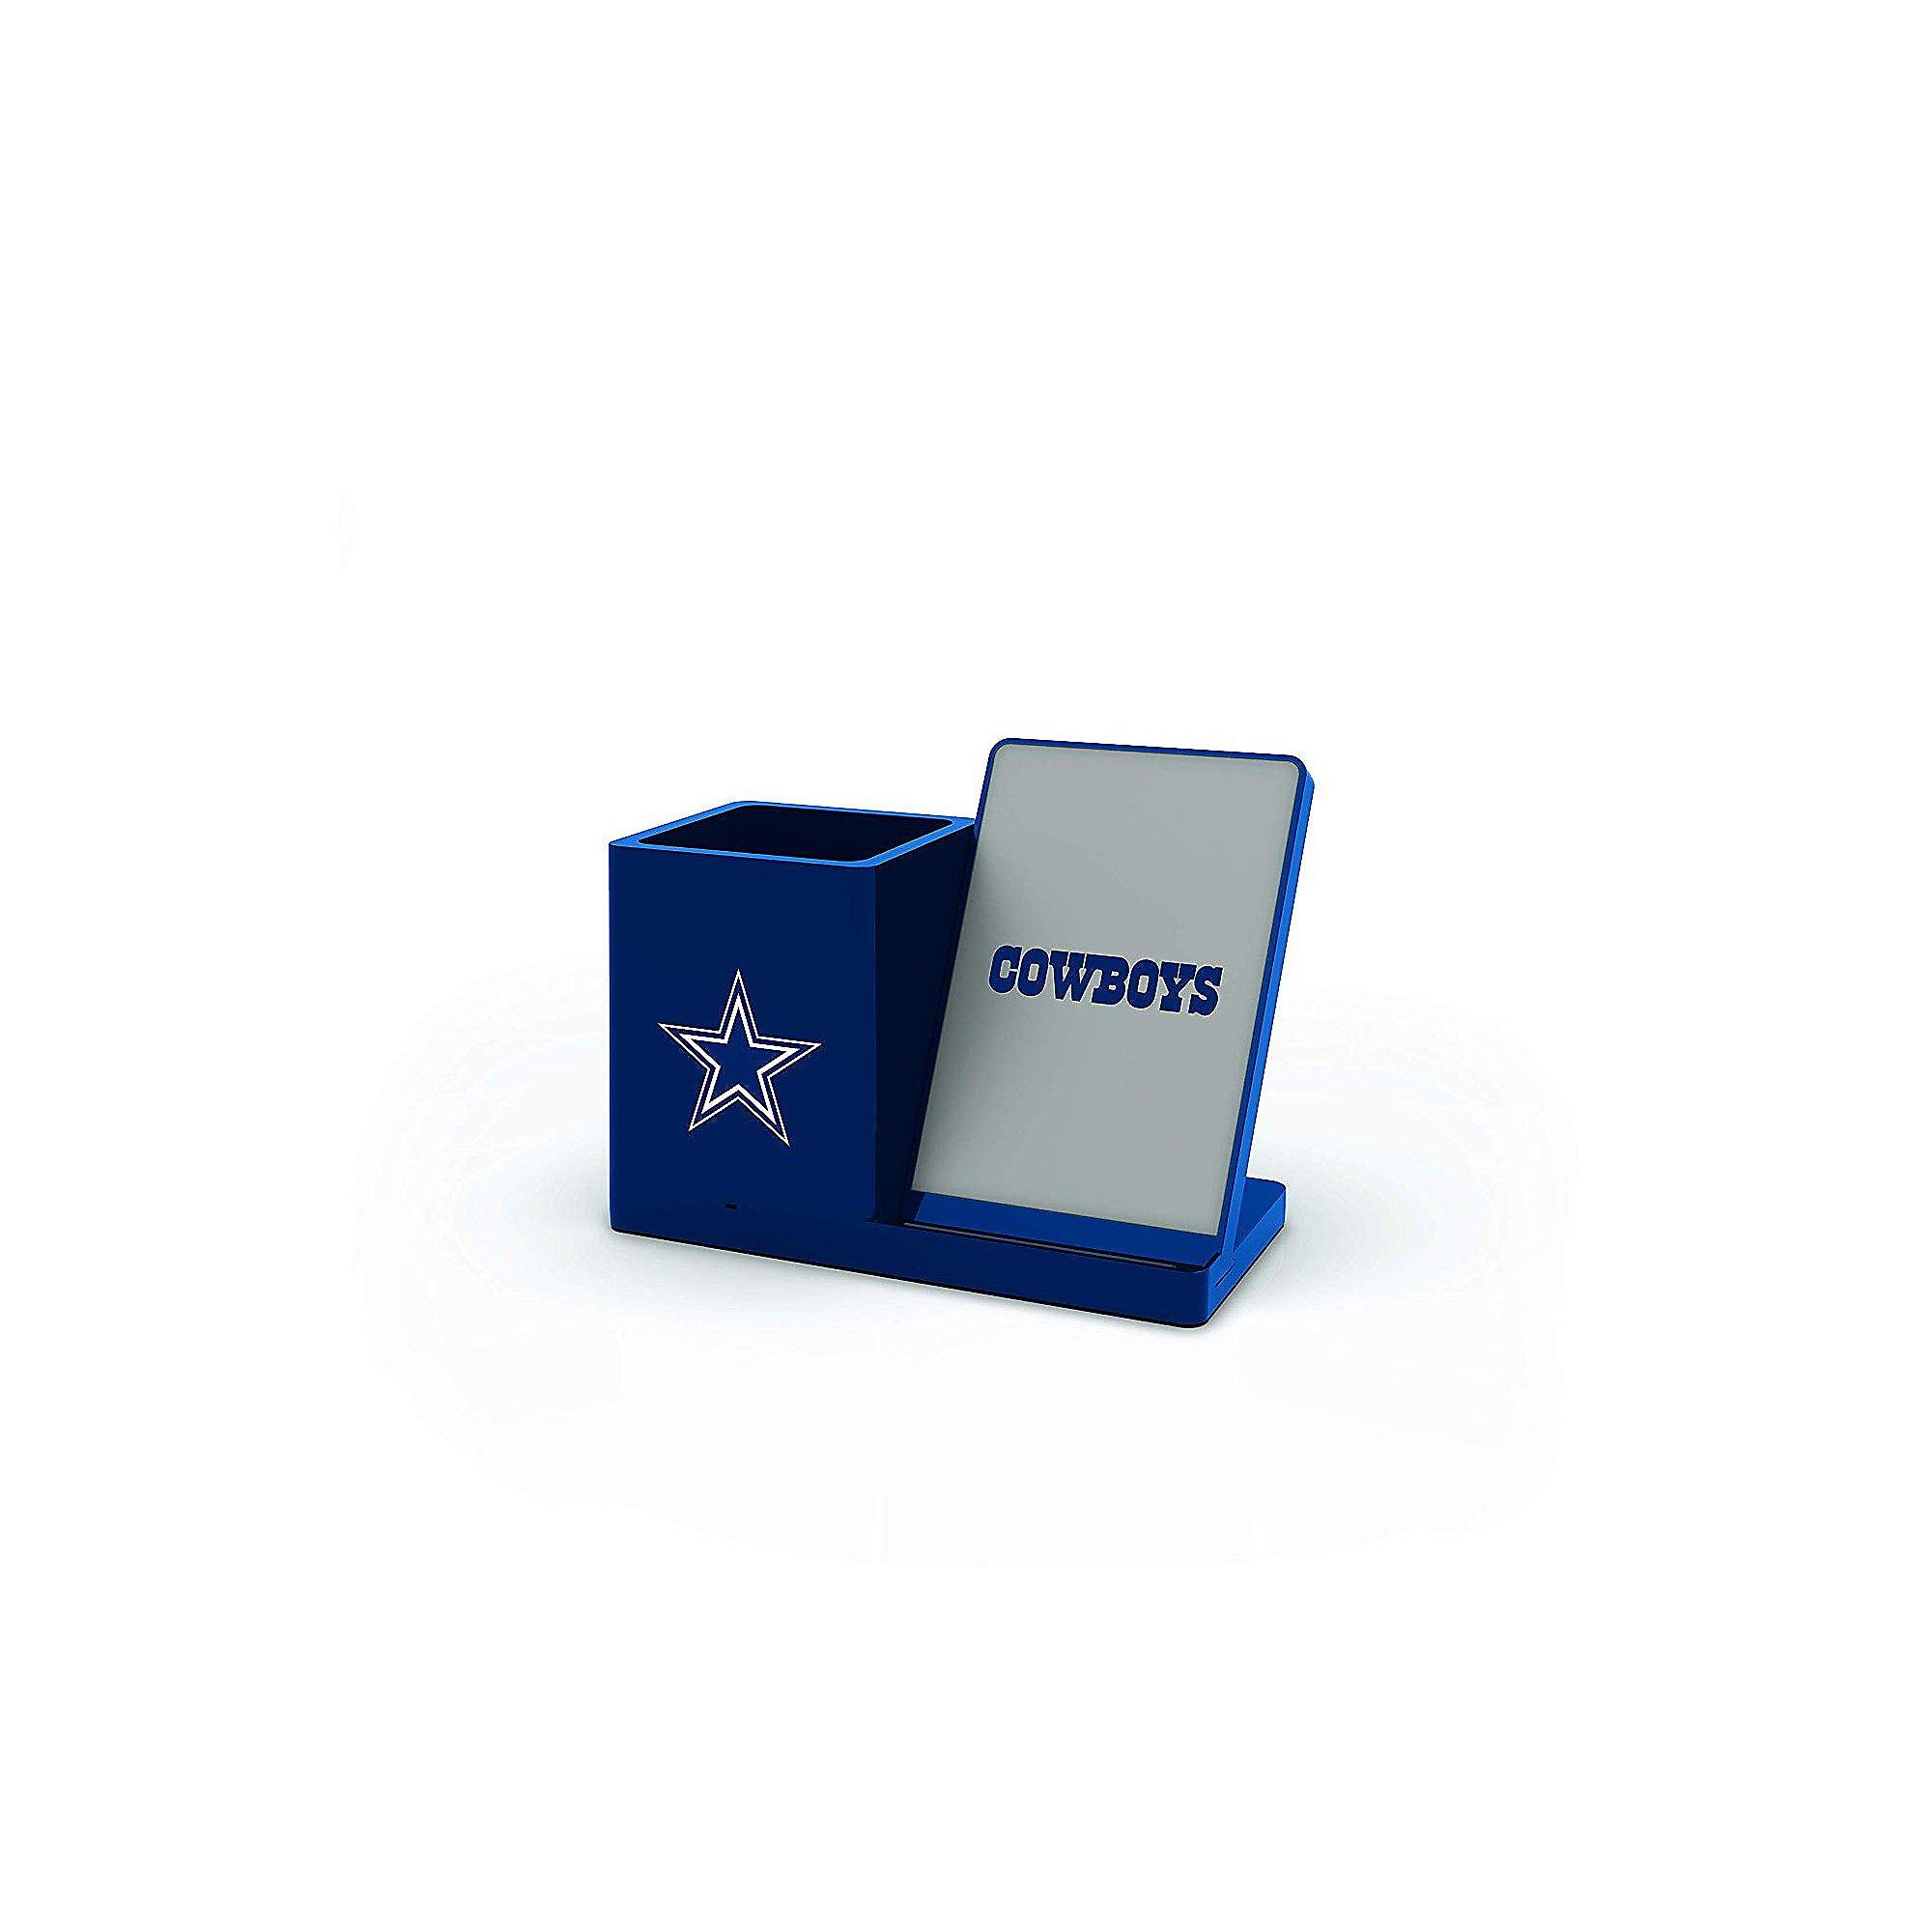 Dallas Cowboys Wireless Charging Pen Holder